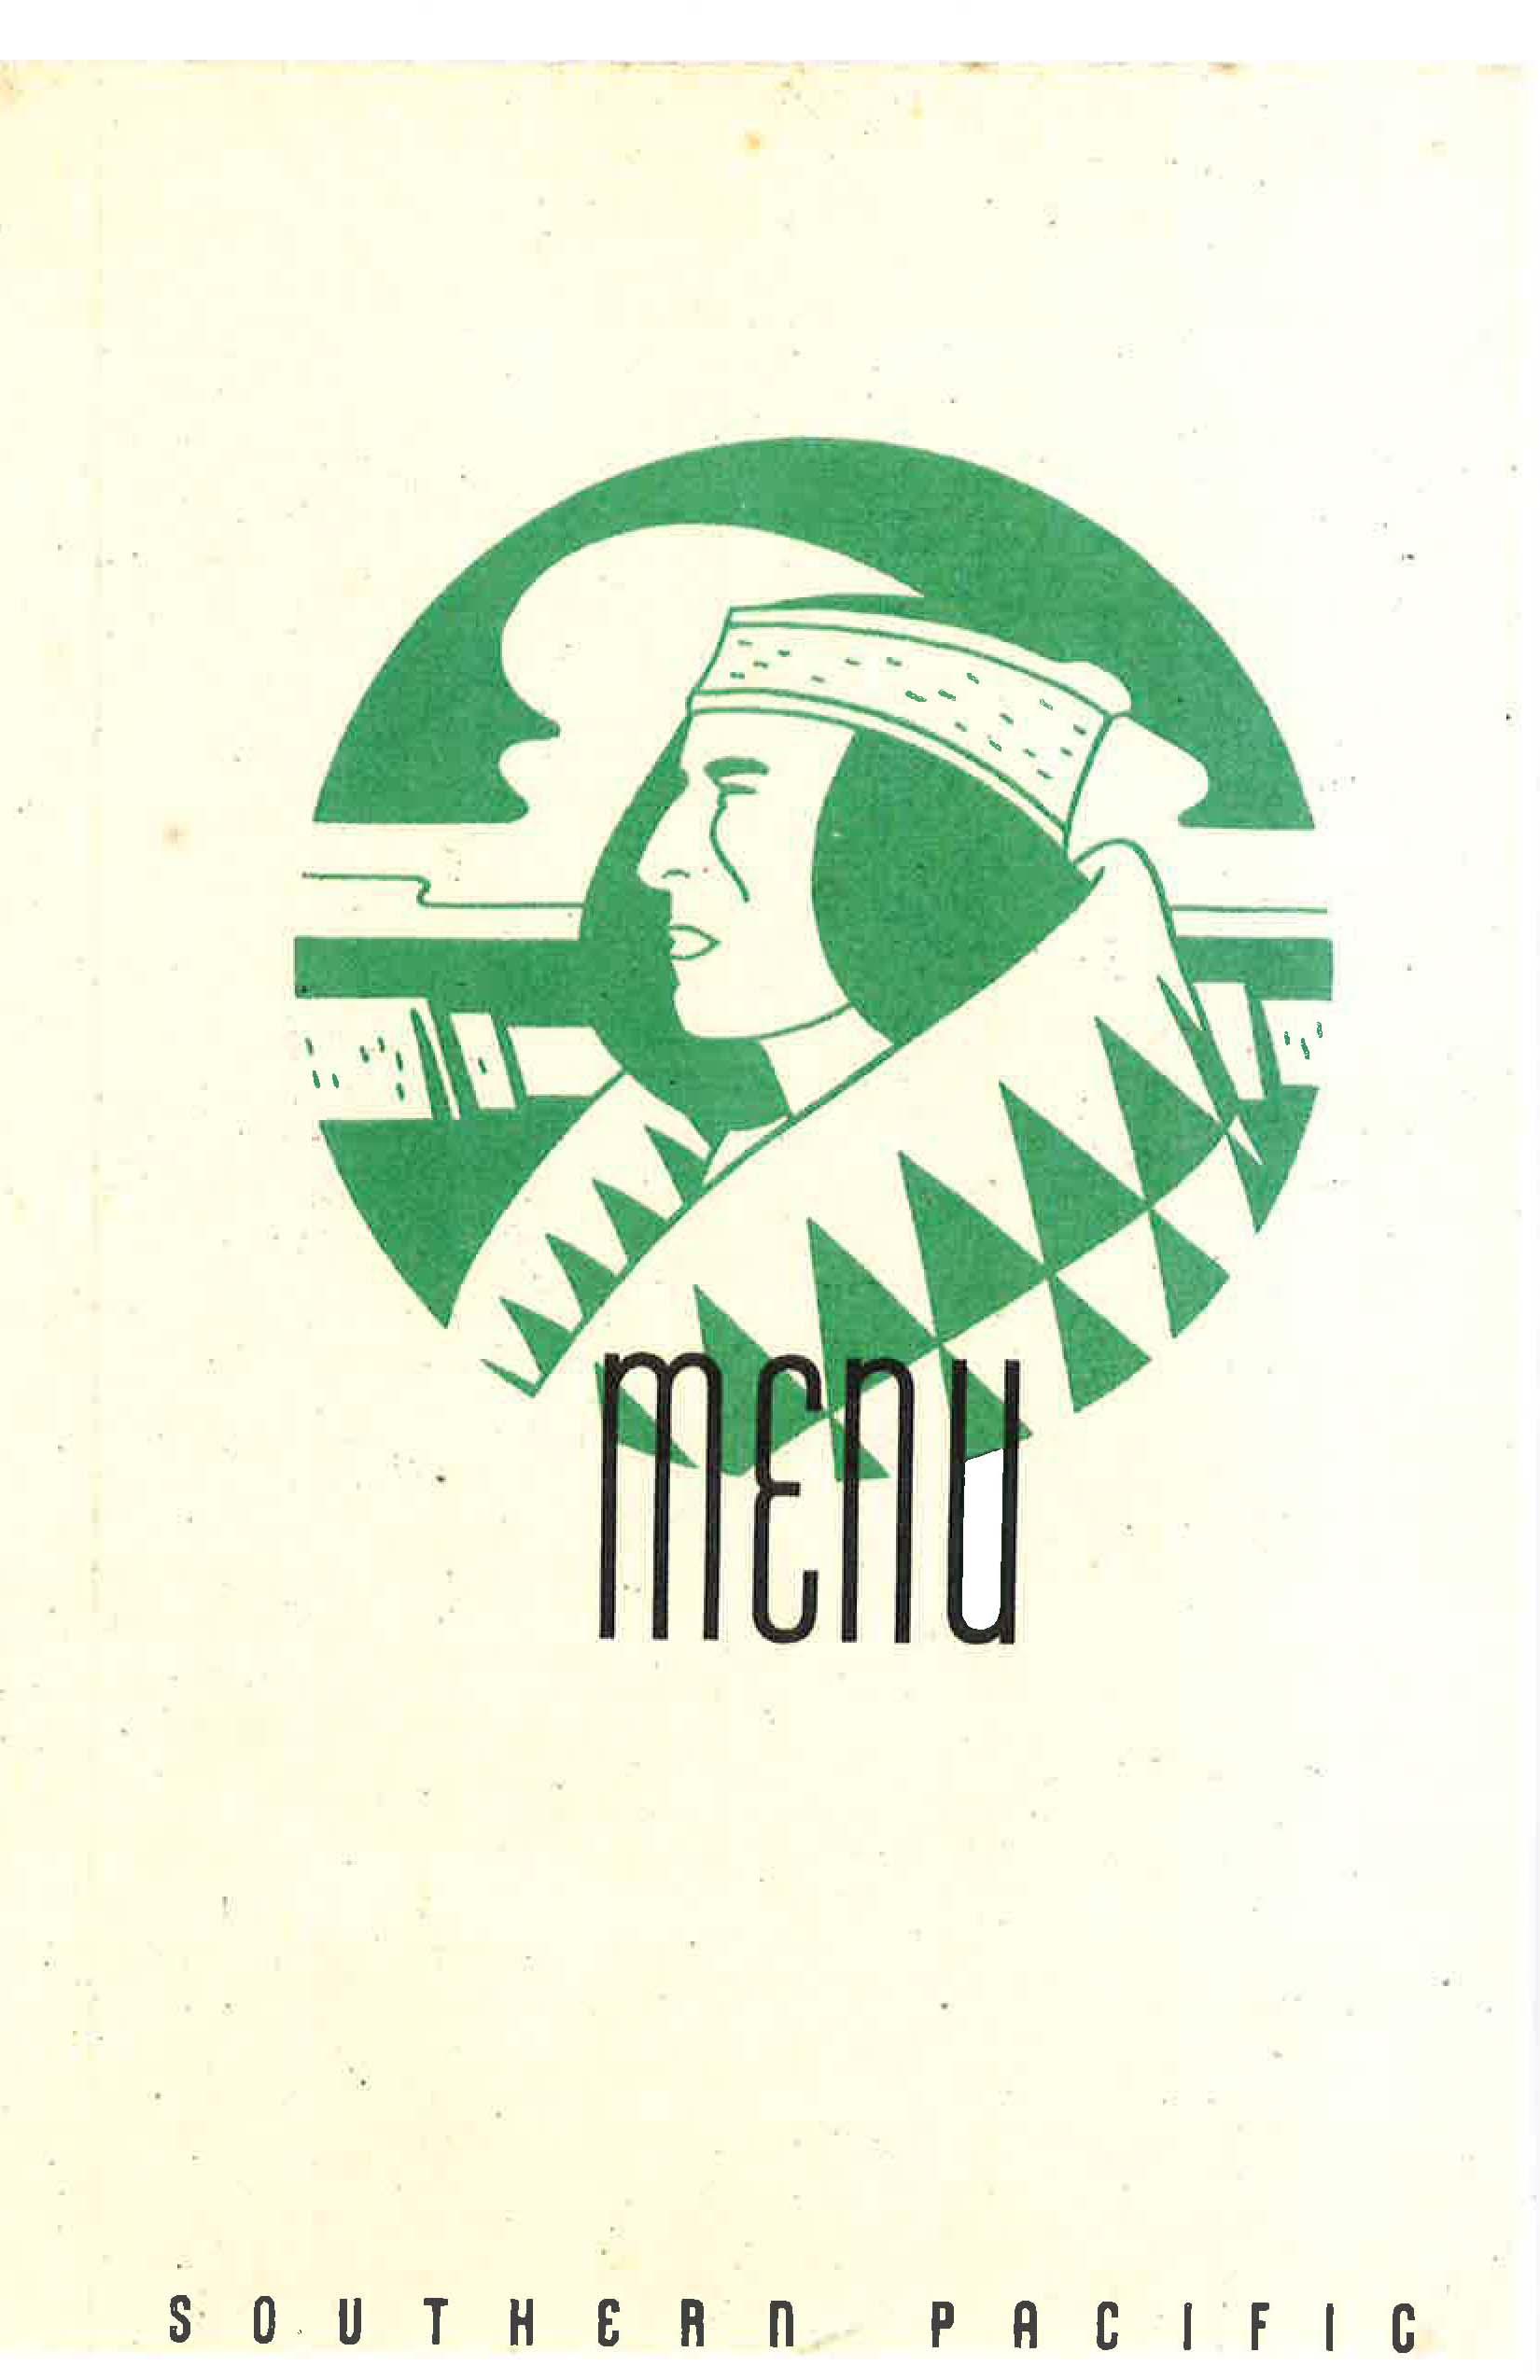 SP+Lunch+Menu+5-37 1a.jpg